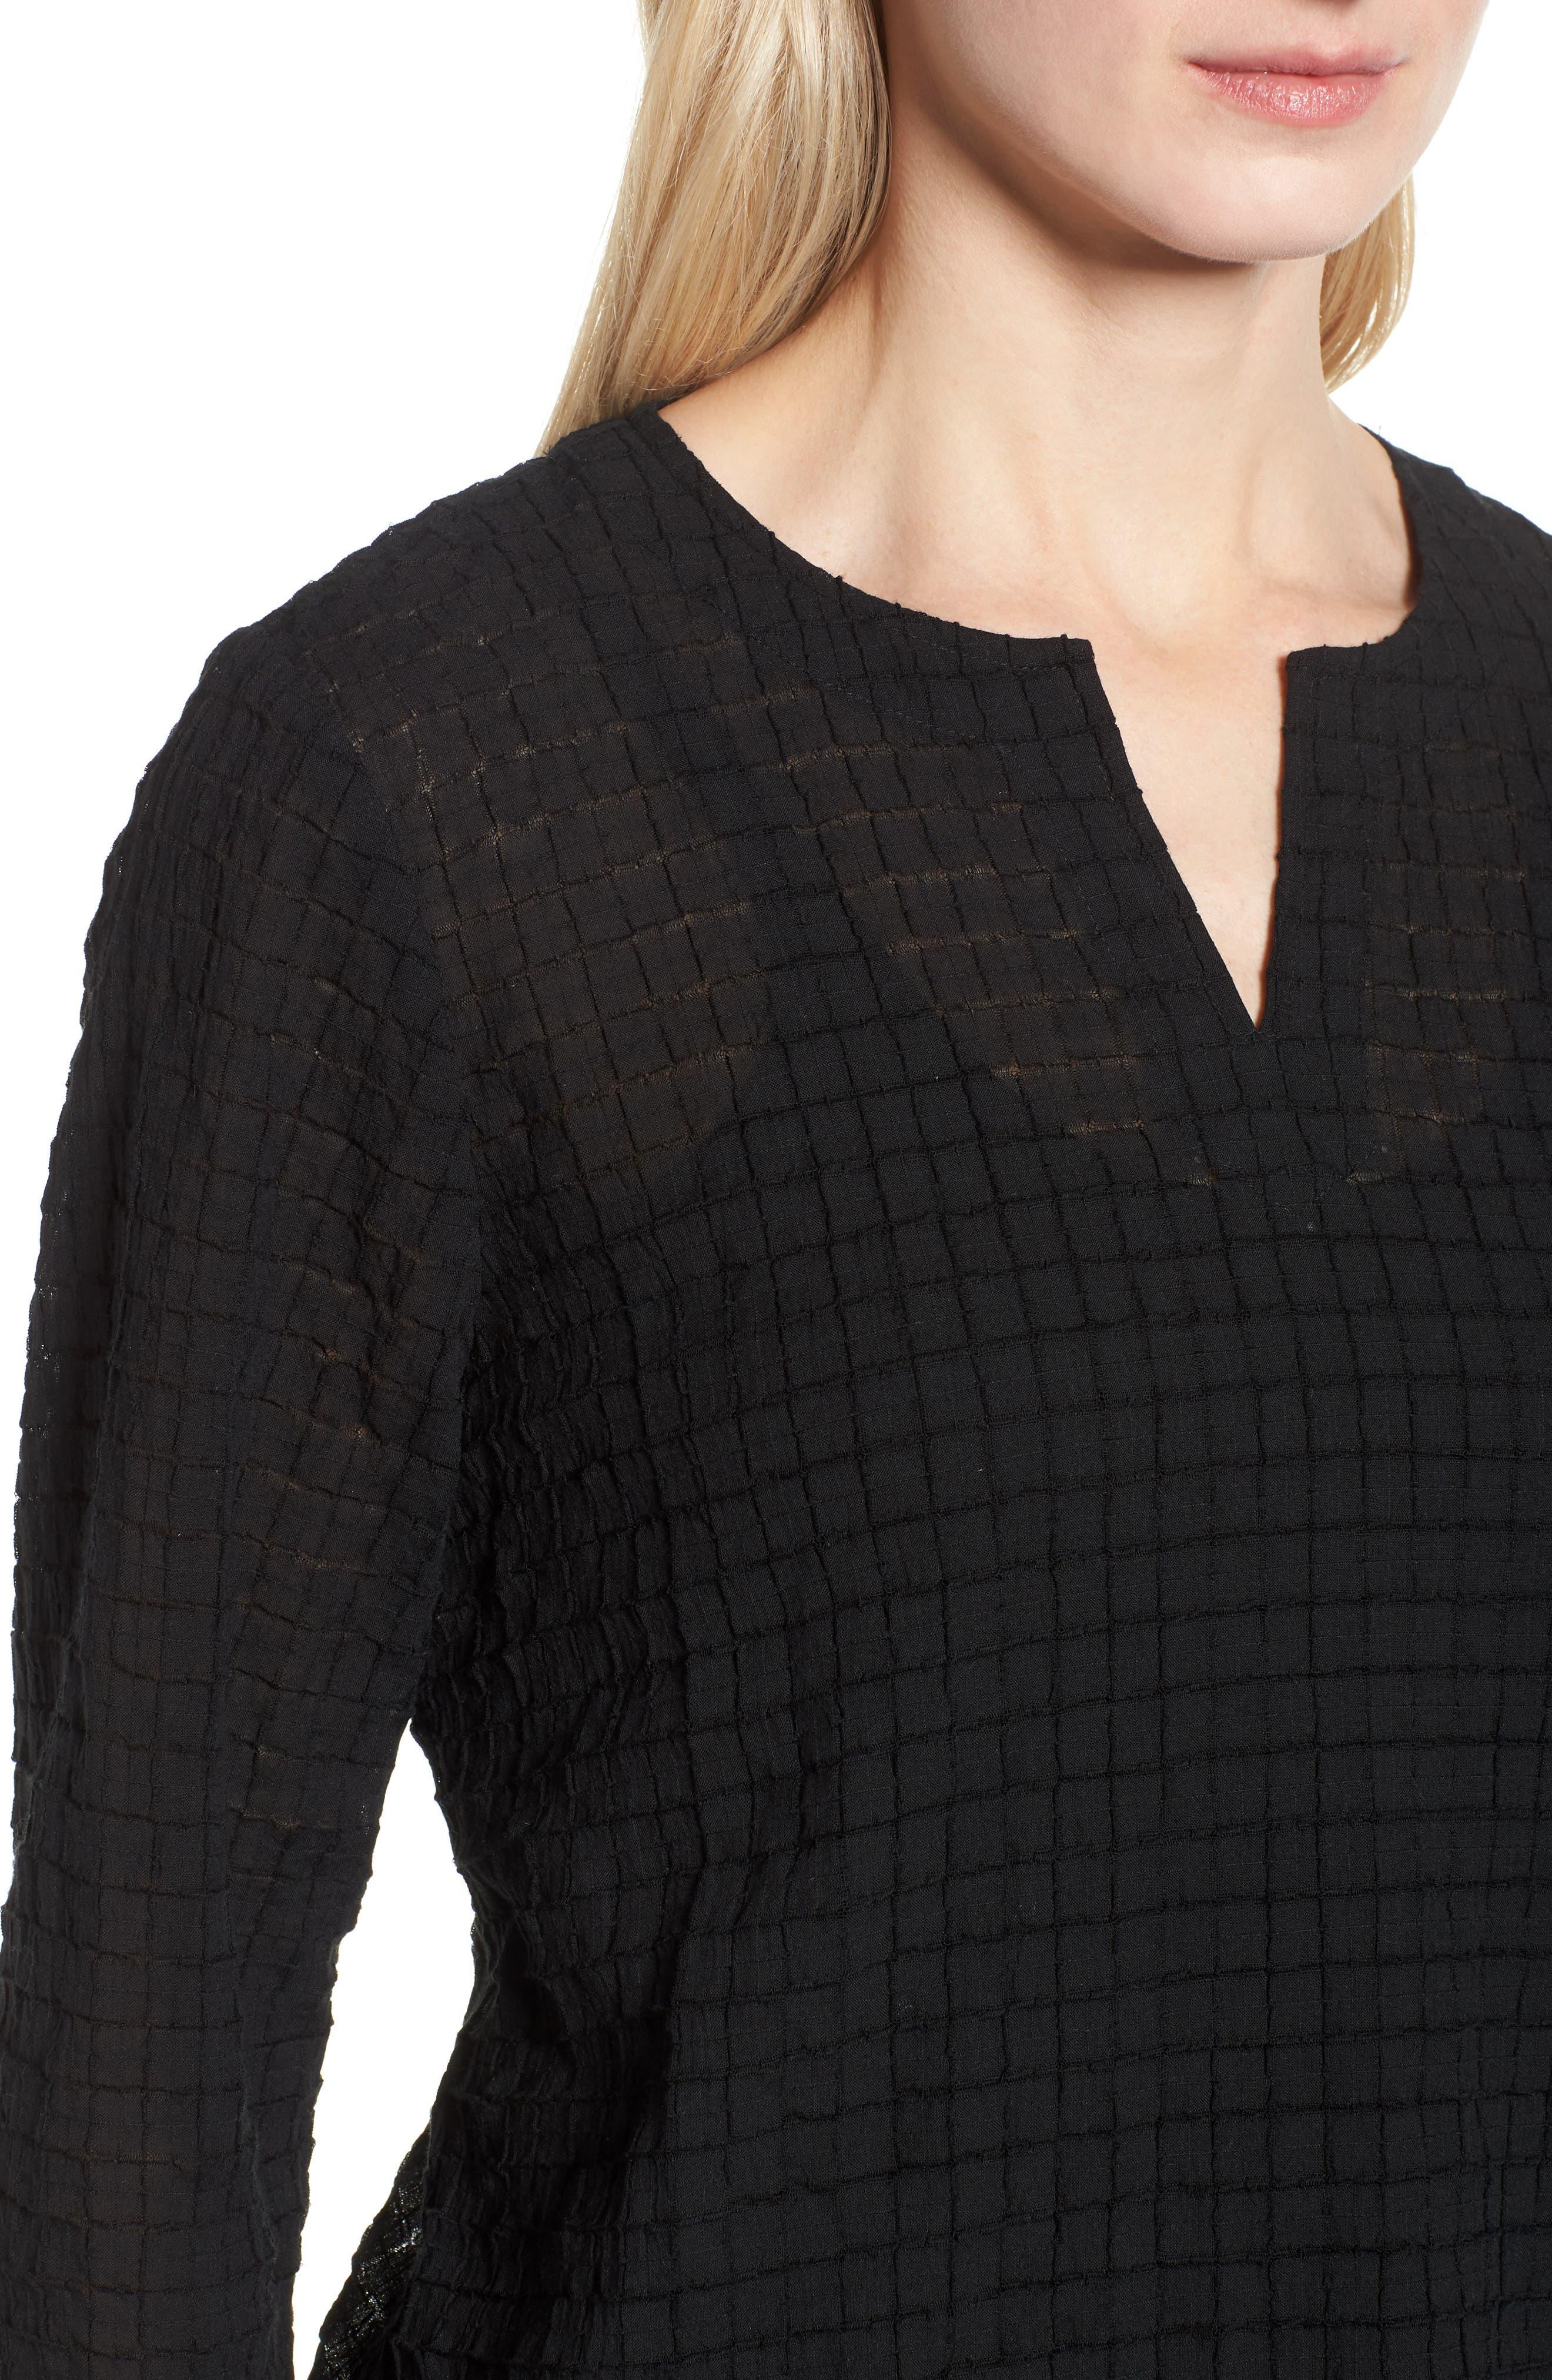 Stretch Organic Cotton Tunic,                             Alternate thumbnail 4, color,                             Black